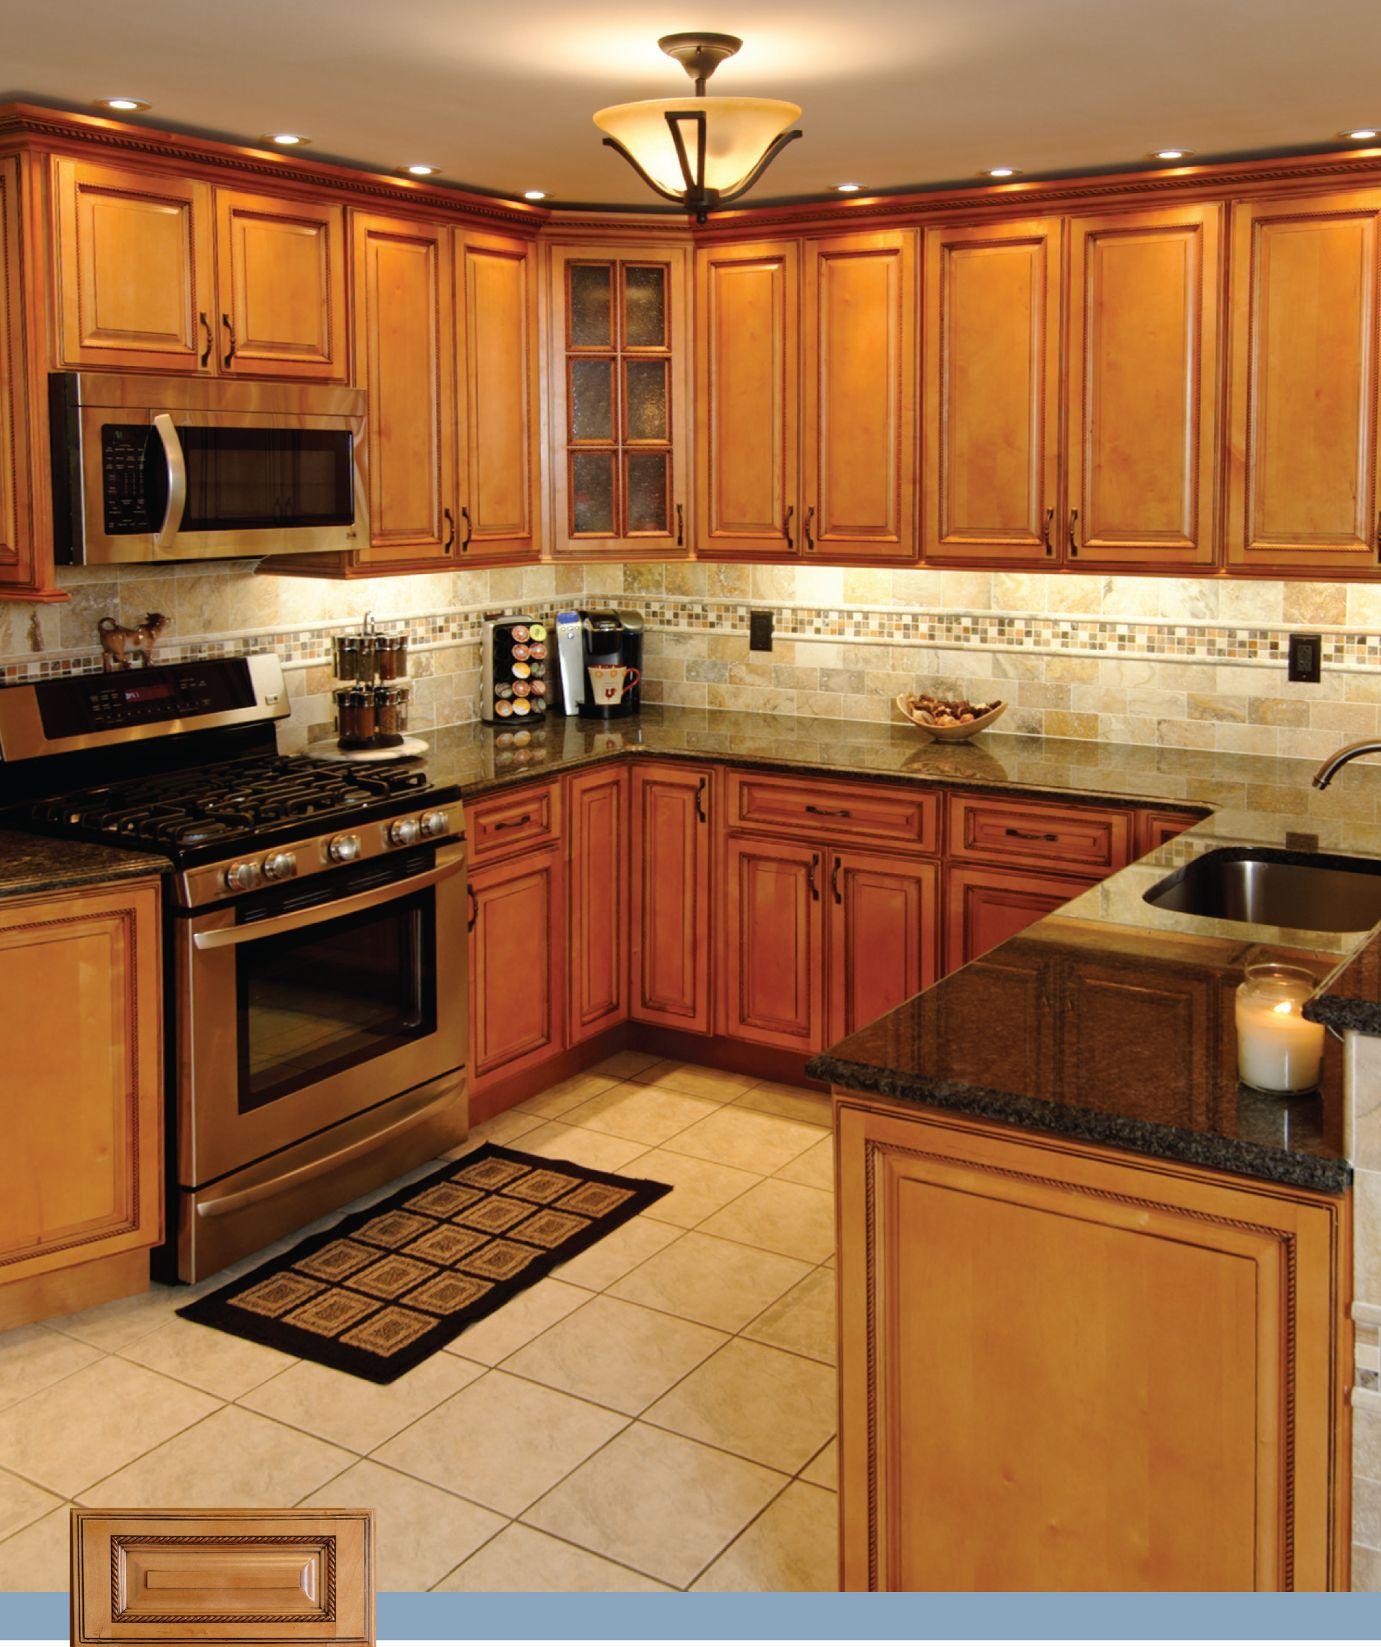 Wooden kitchen pantry Photo - 1